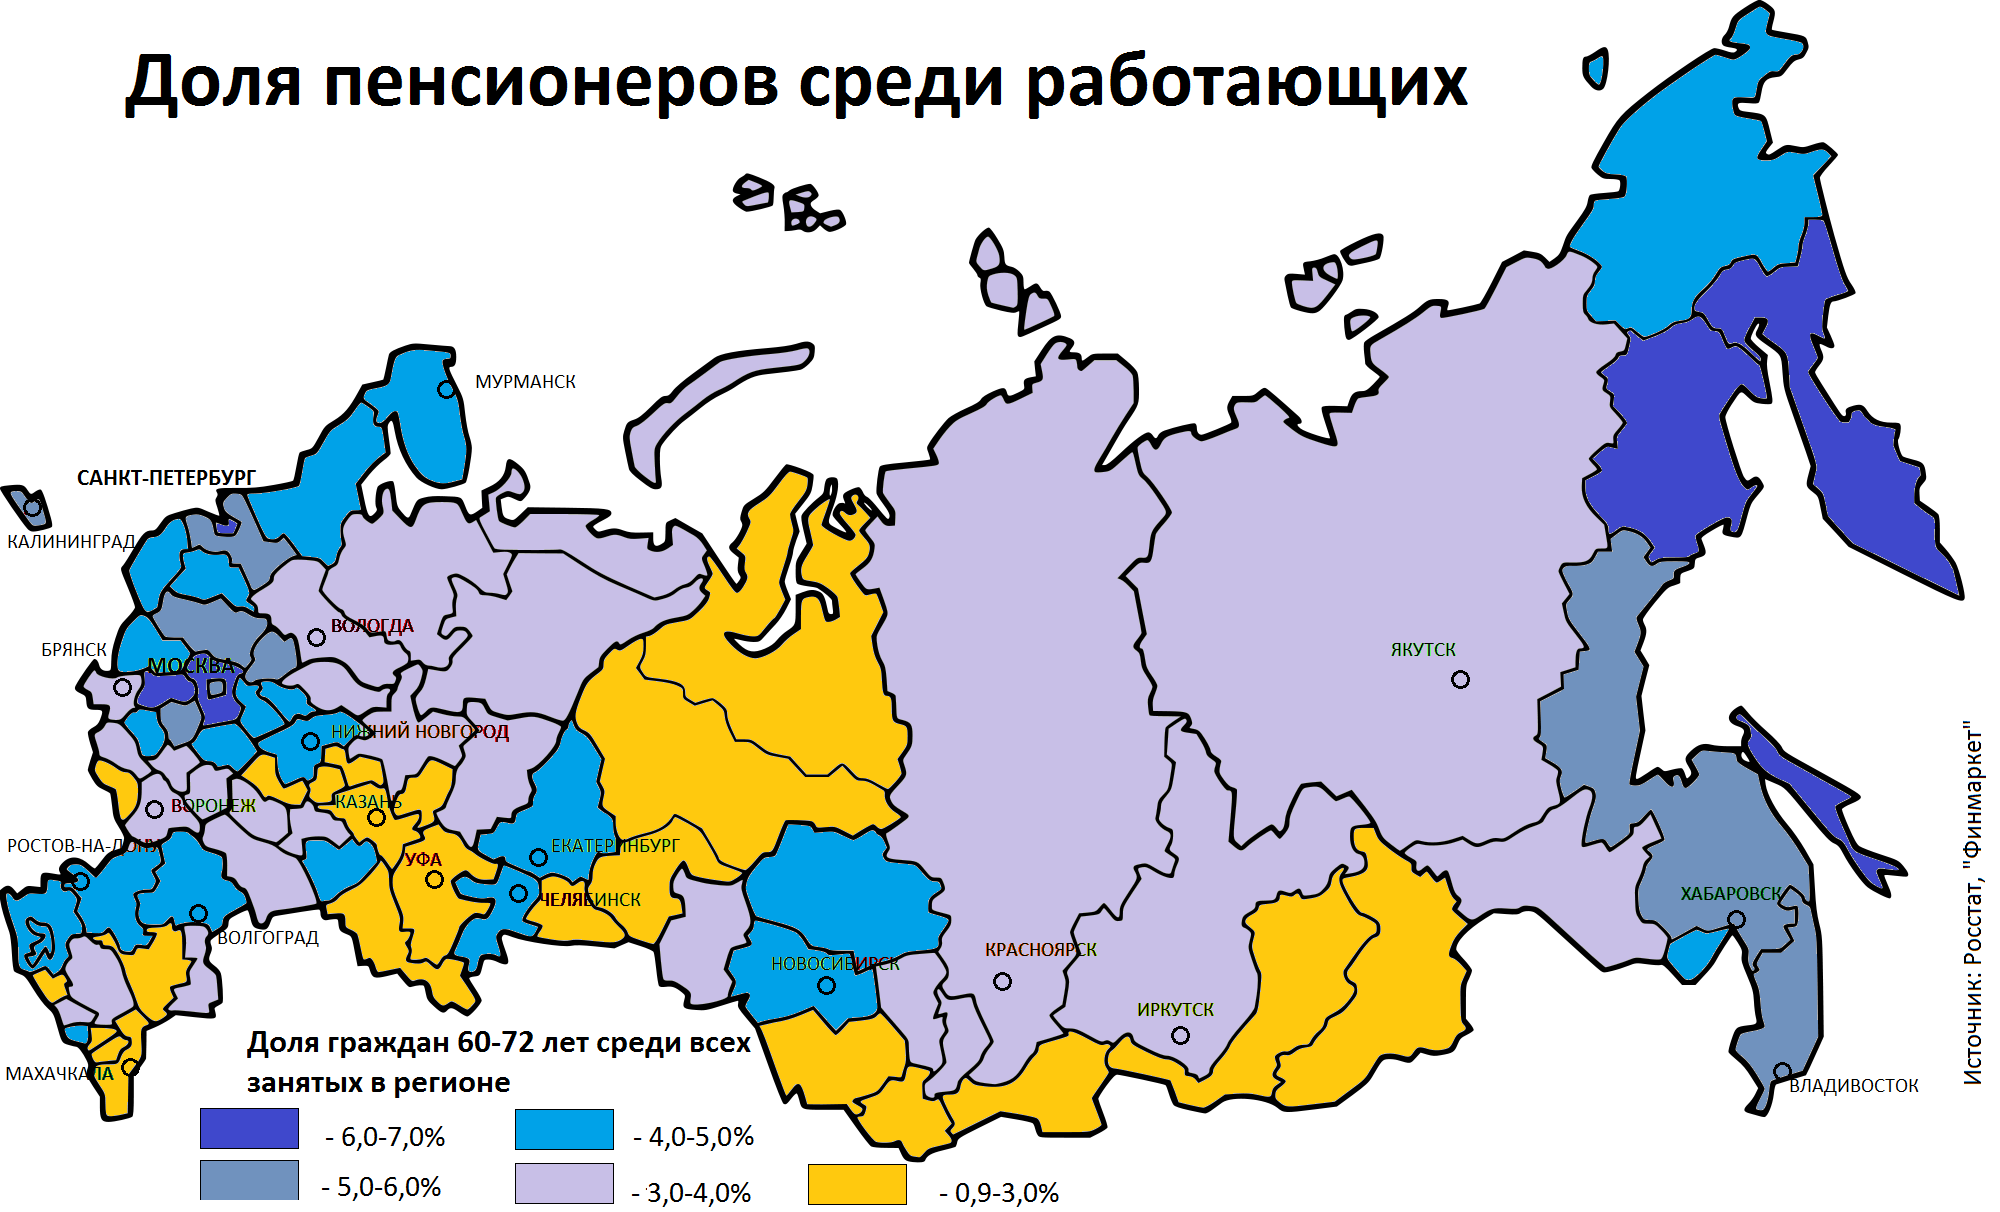 http://fmimg.finmarket.ru/FMCharts/180313/pens2.png